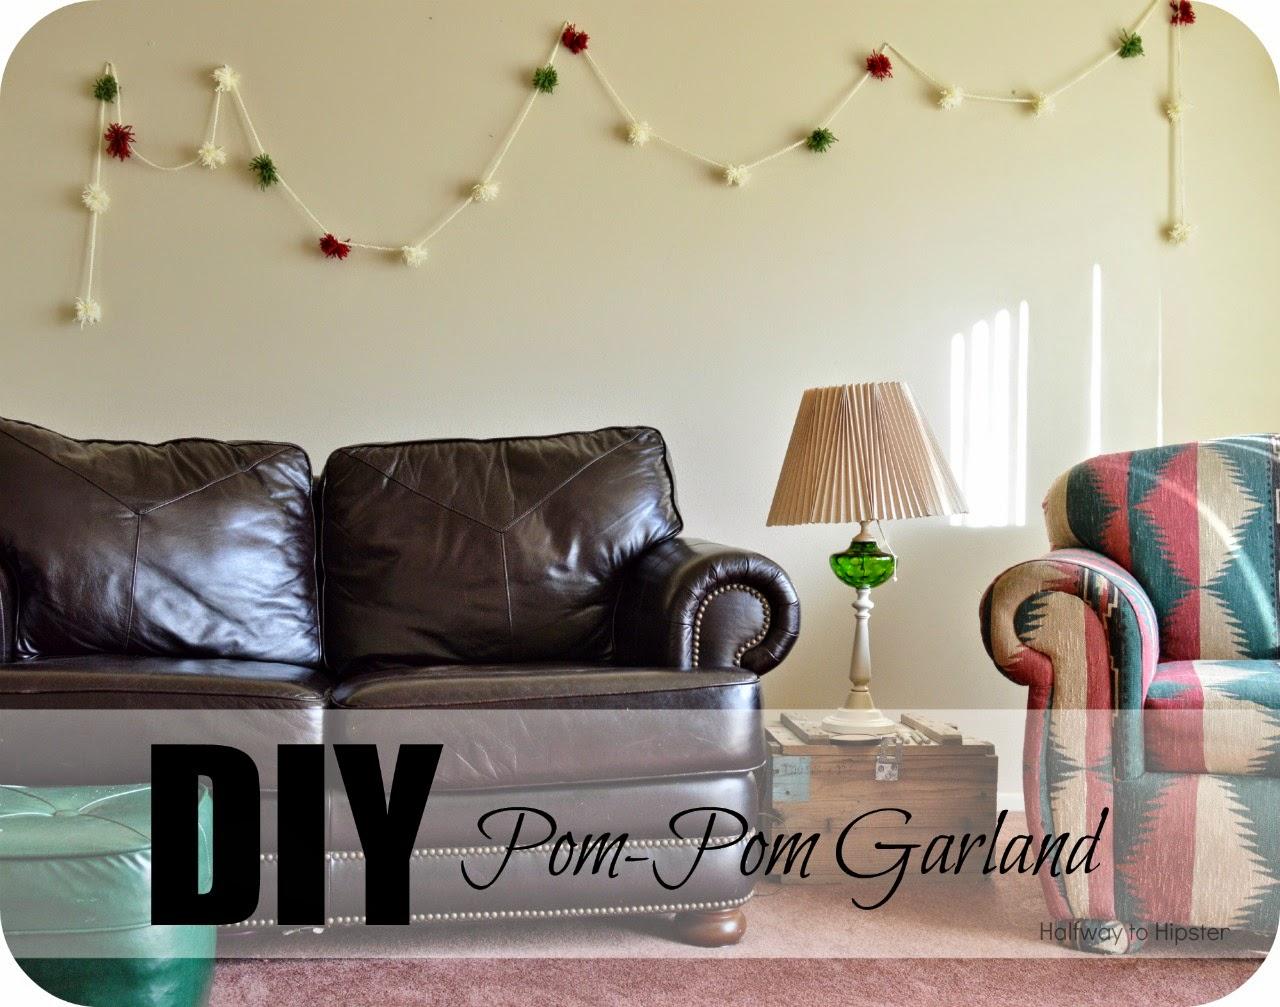 DIY Pom-Pom Garland